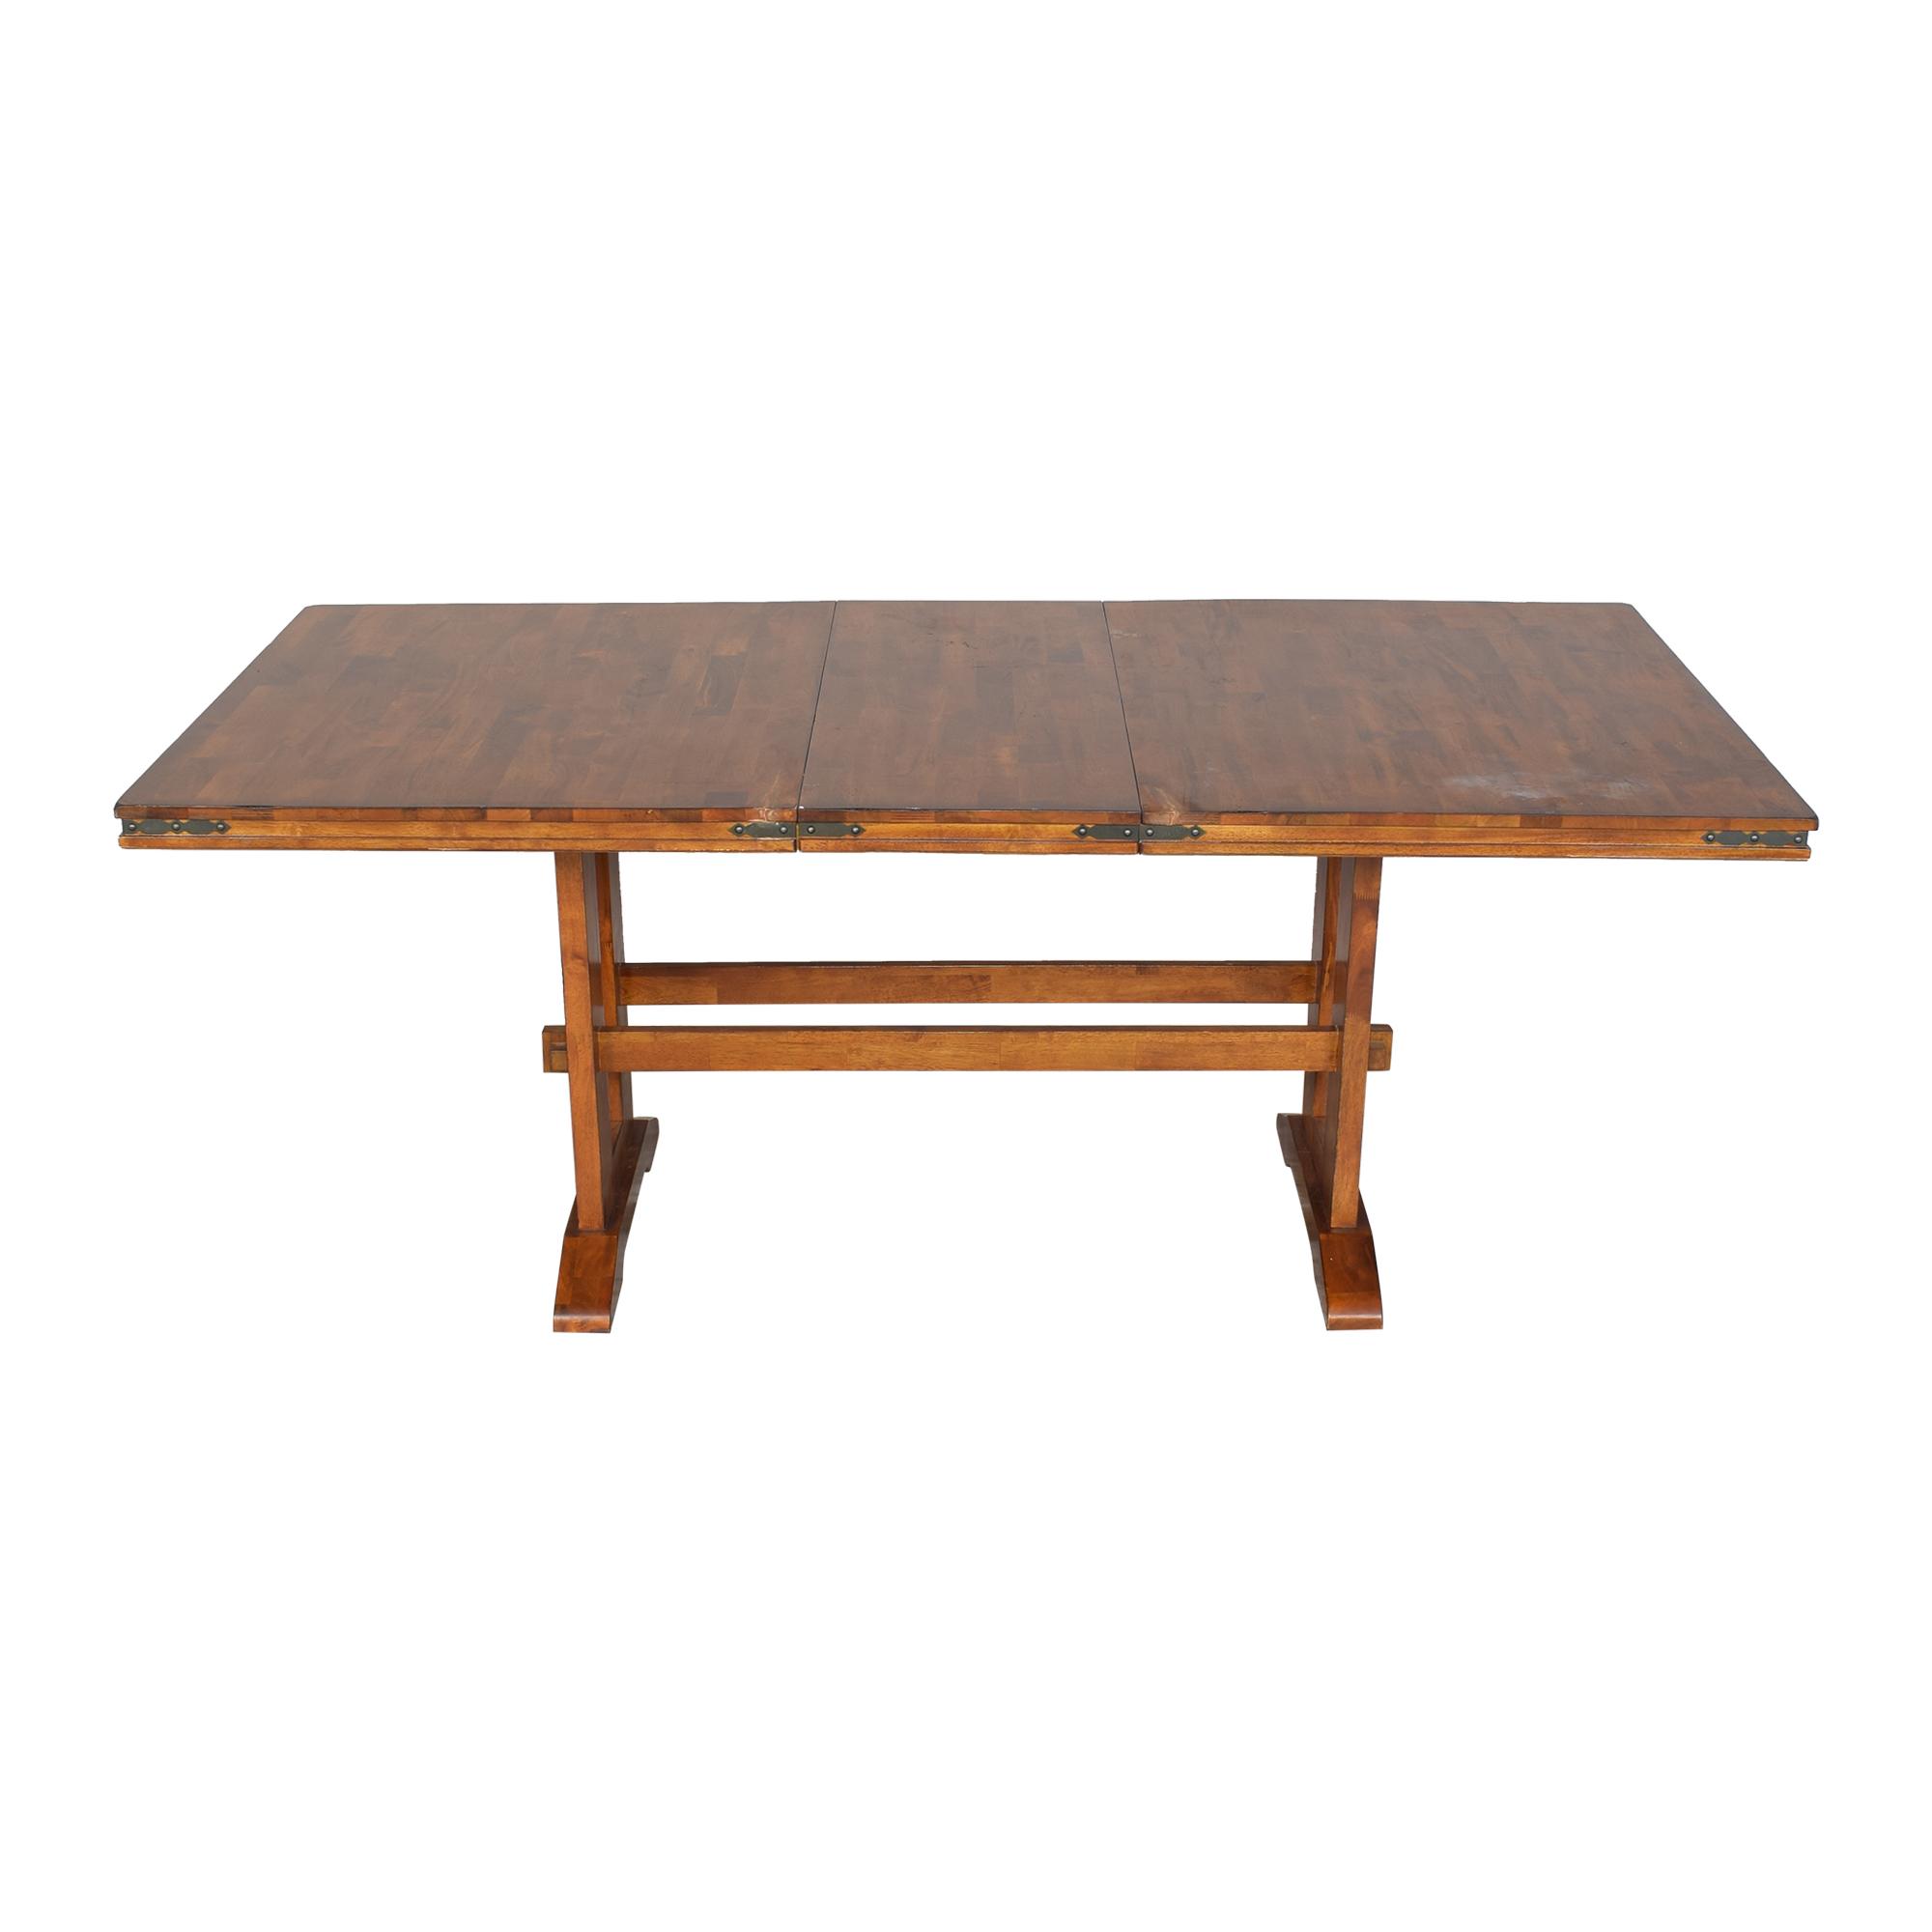 Lenox Lenox Extendable Dining Table discount